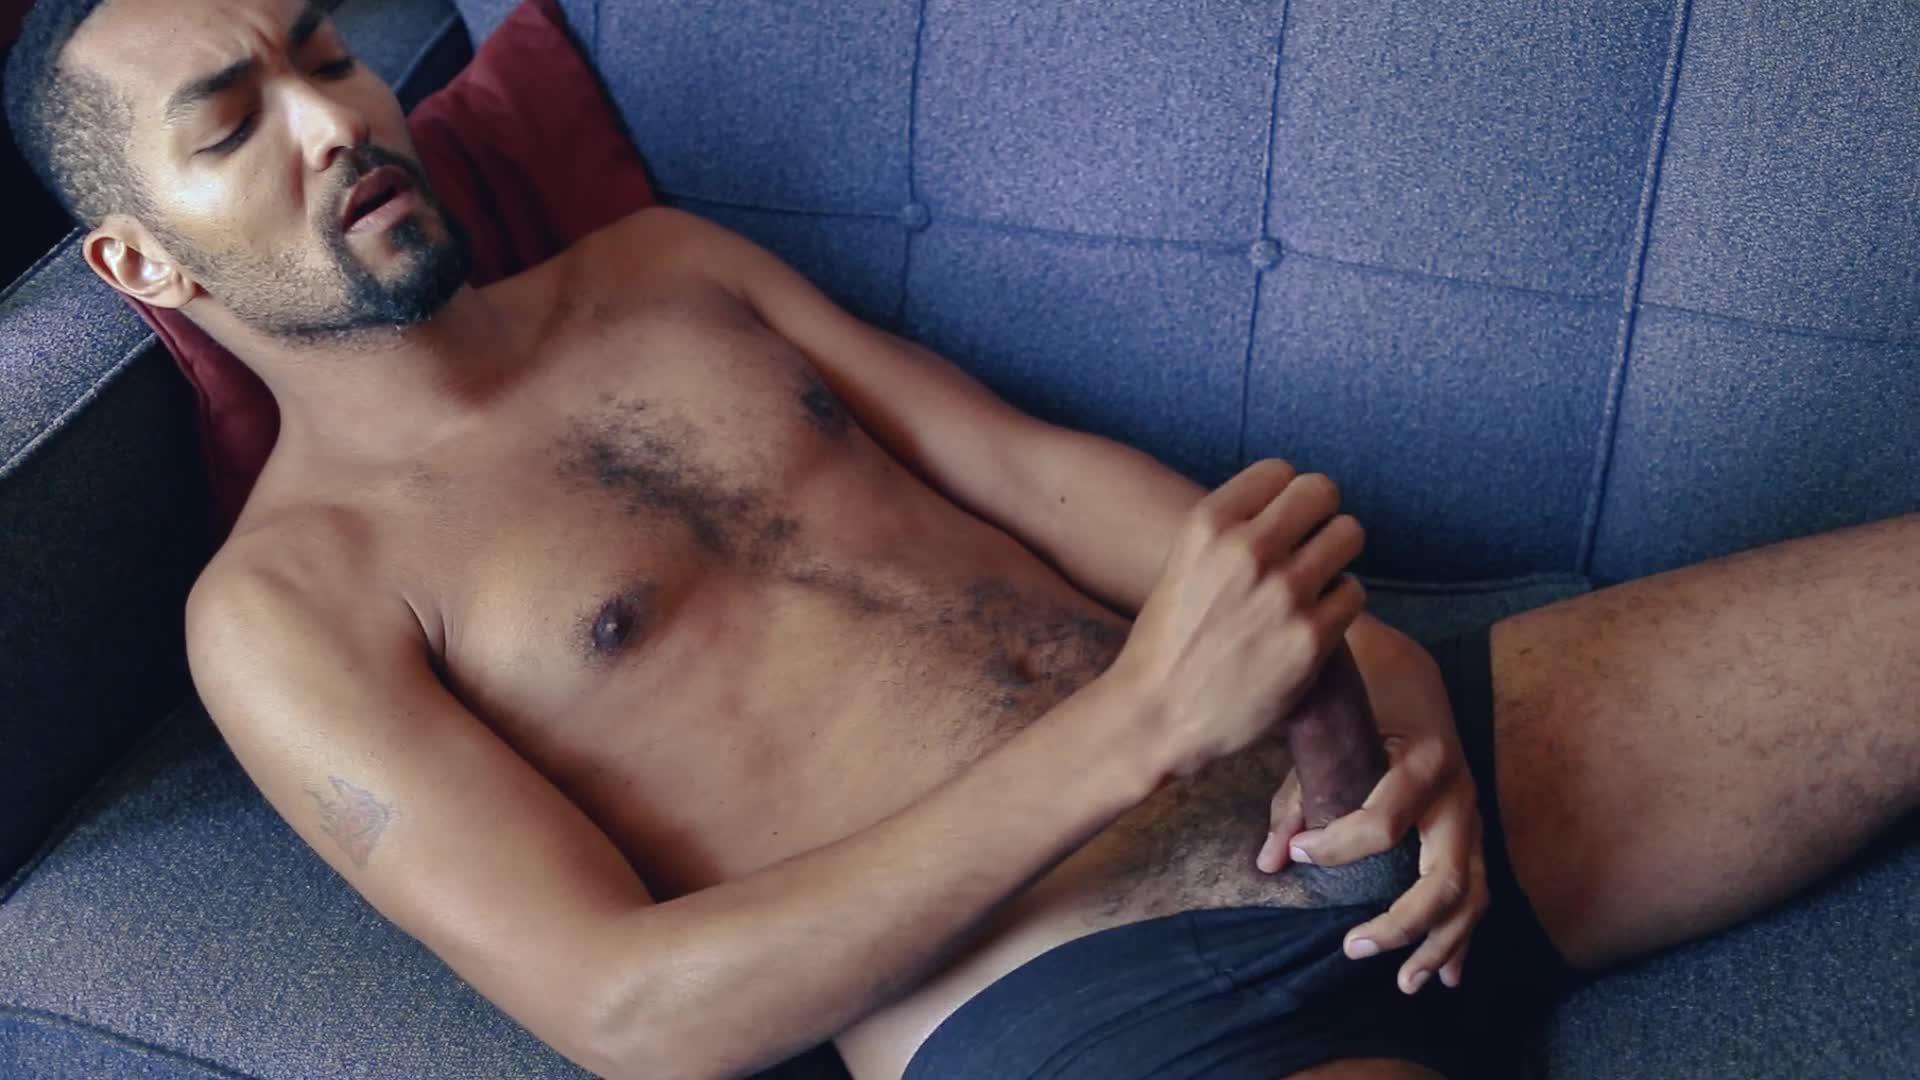 taboo-masturbation-for-men-baywatch-nude-fakes